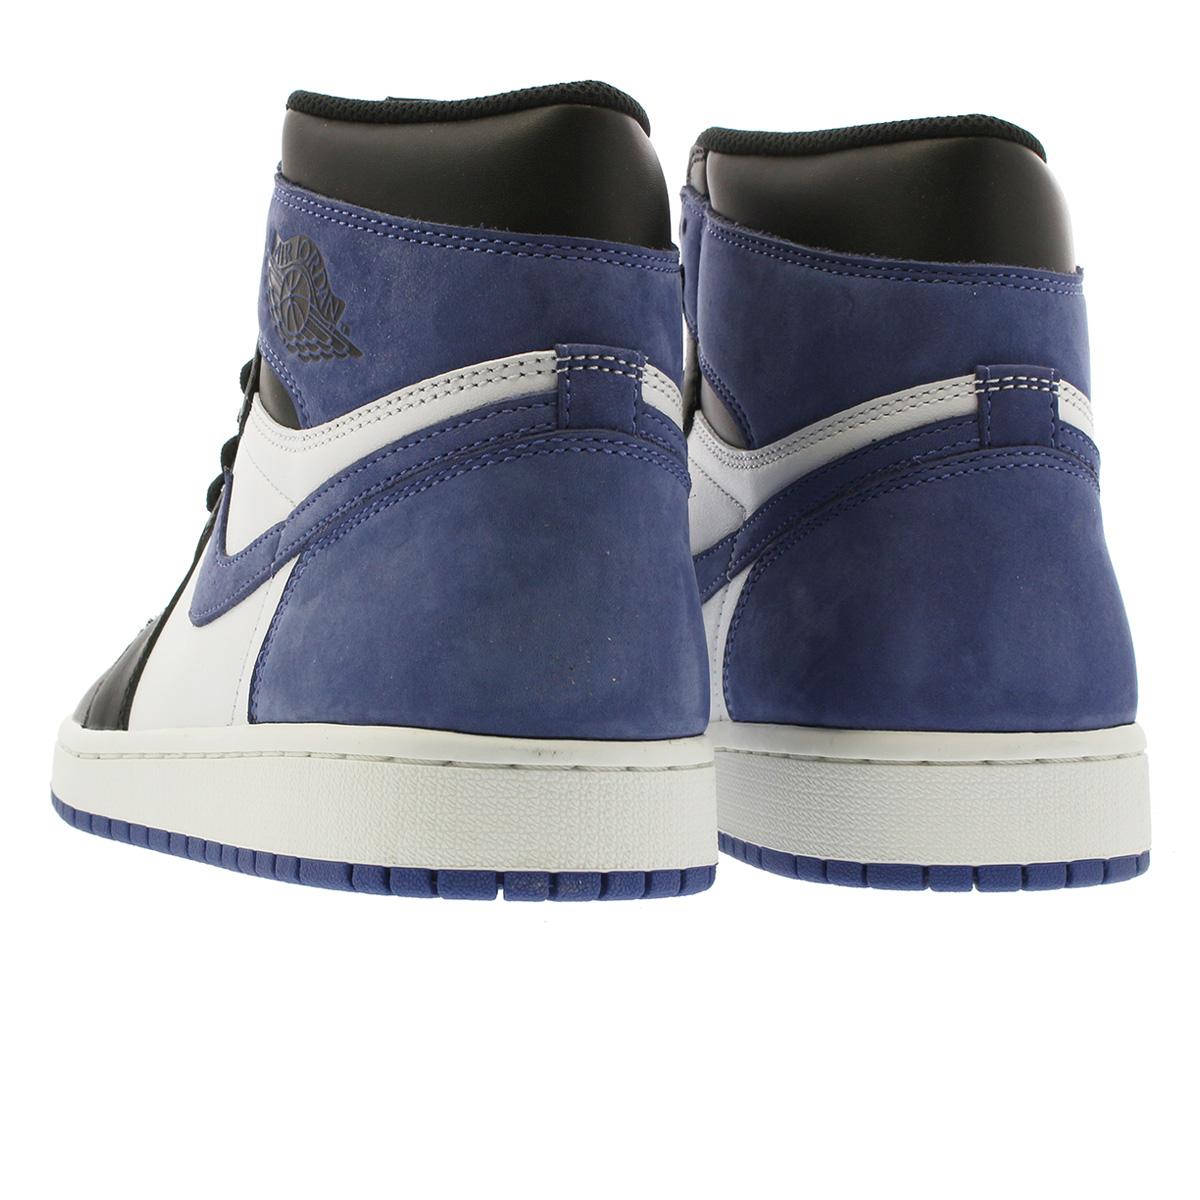 b37f9130eaca3 NIKE AIR JORDAN 1 RETRO HIGH OG Nike Air Jordan 1 nostalgic high OG SUMMIT  WHITE BLUE MOON BLACK 555